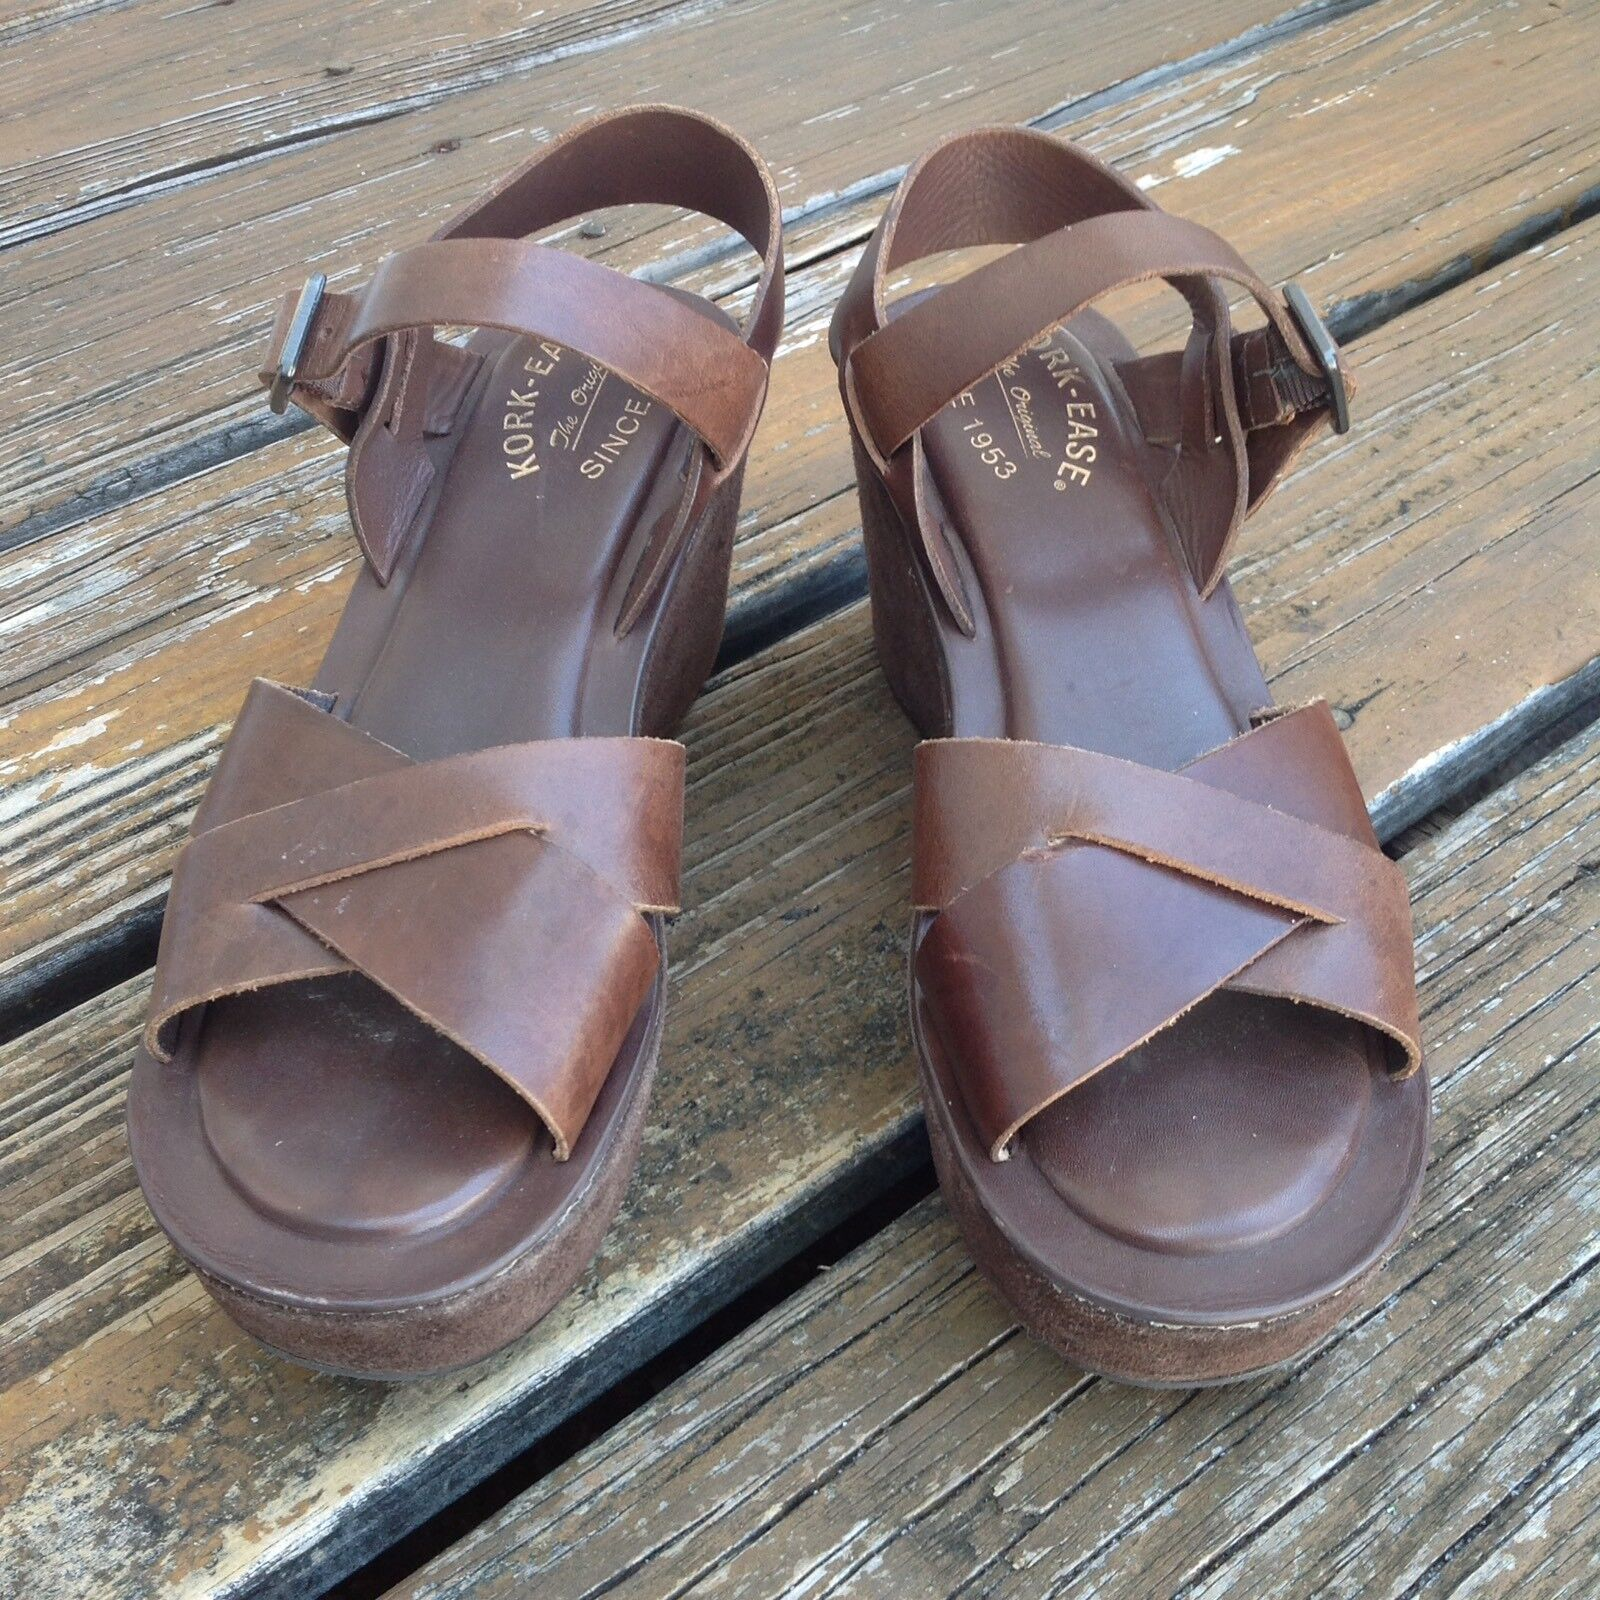 Kork Ease Braun Wedge Platform Sandales Damenschuhe 9 EU 39 Leder Suede Heels Schuhes